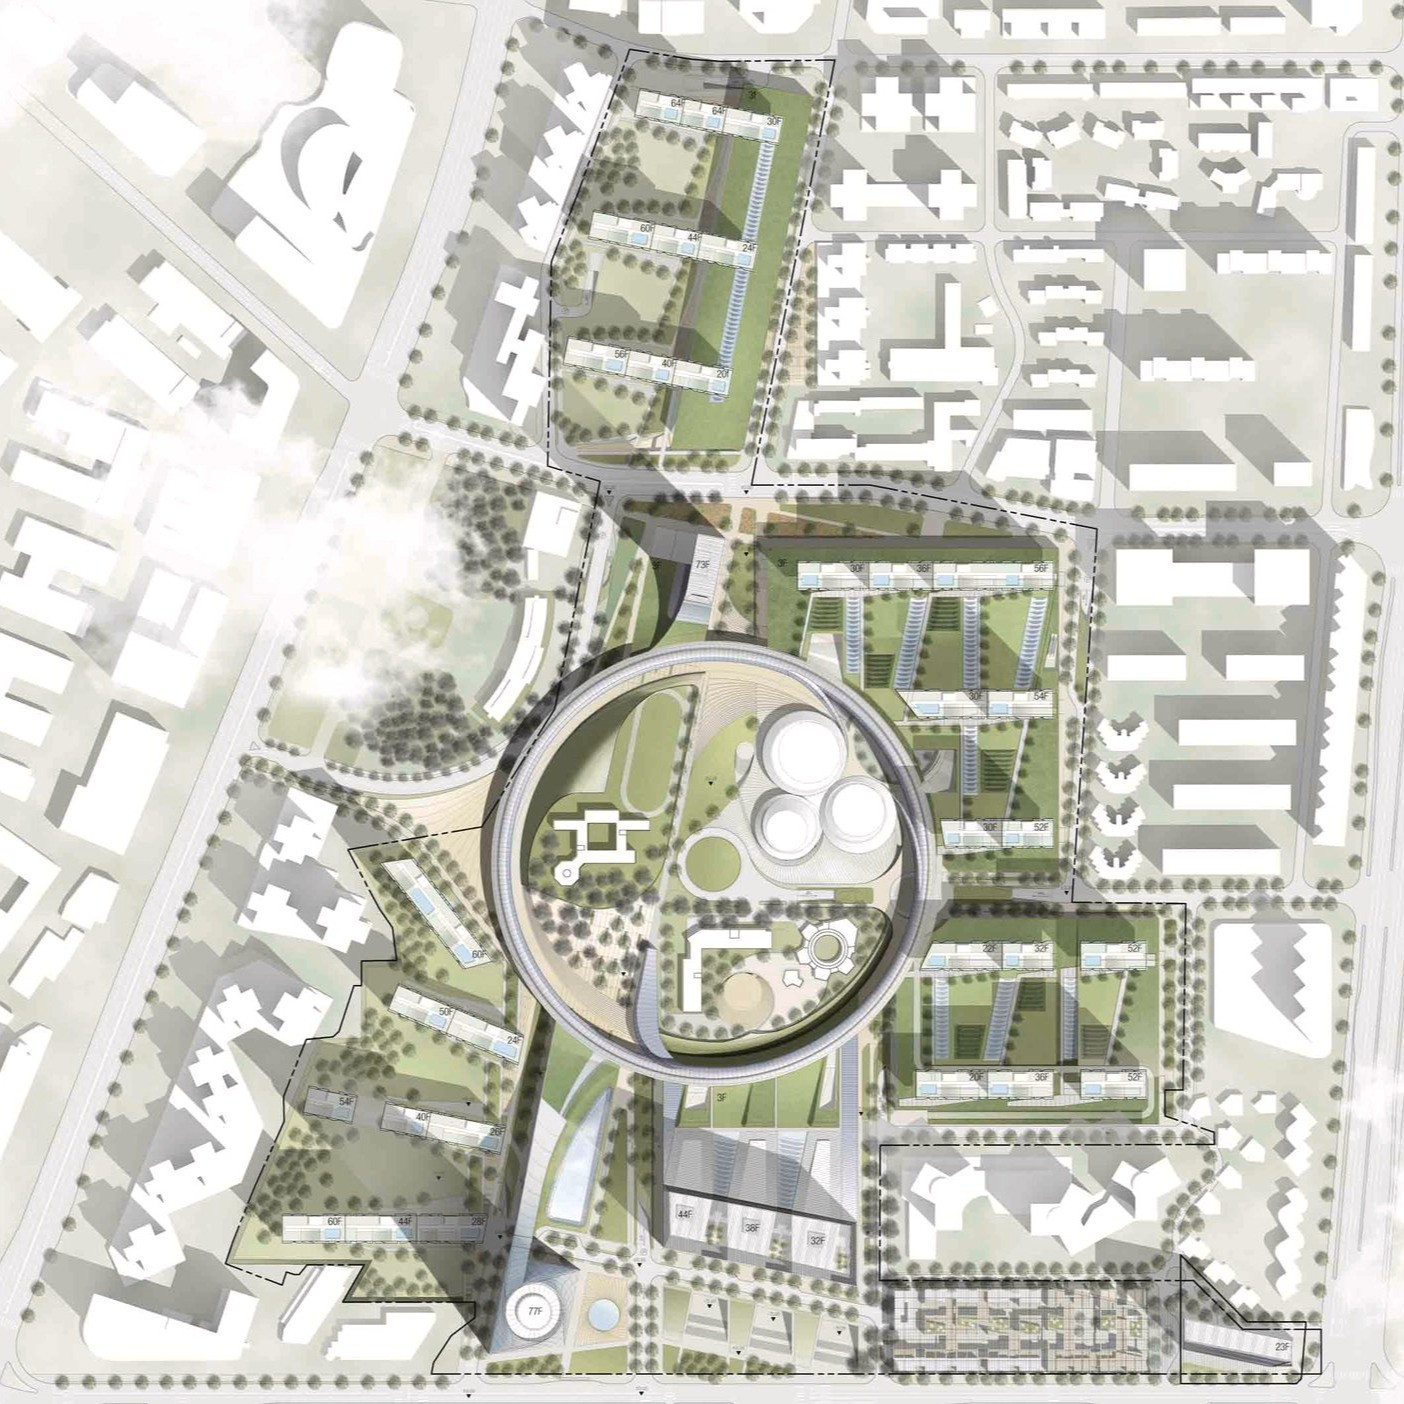 Urban Design & Planning